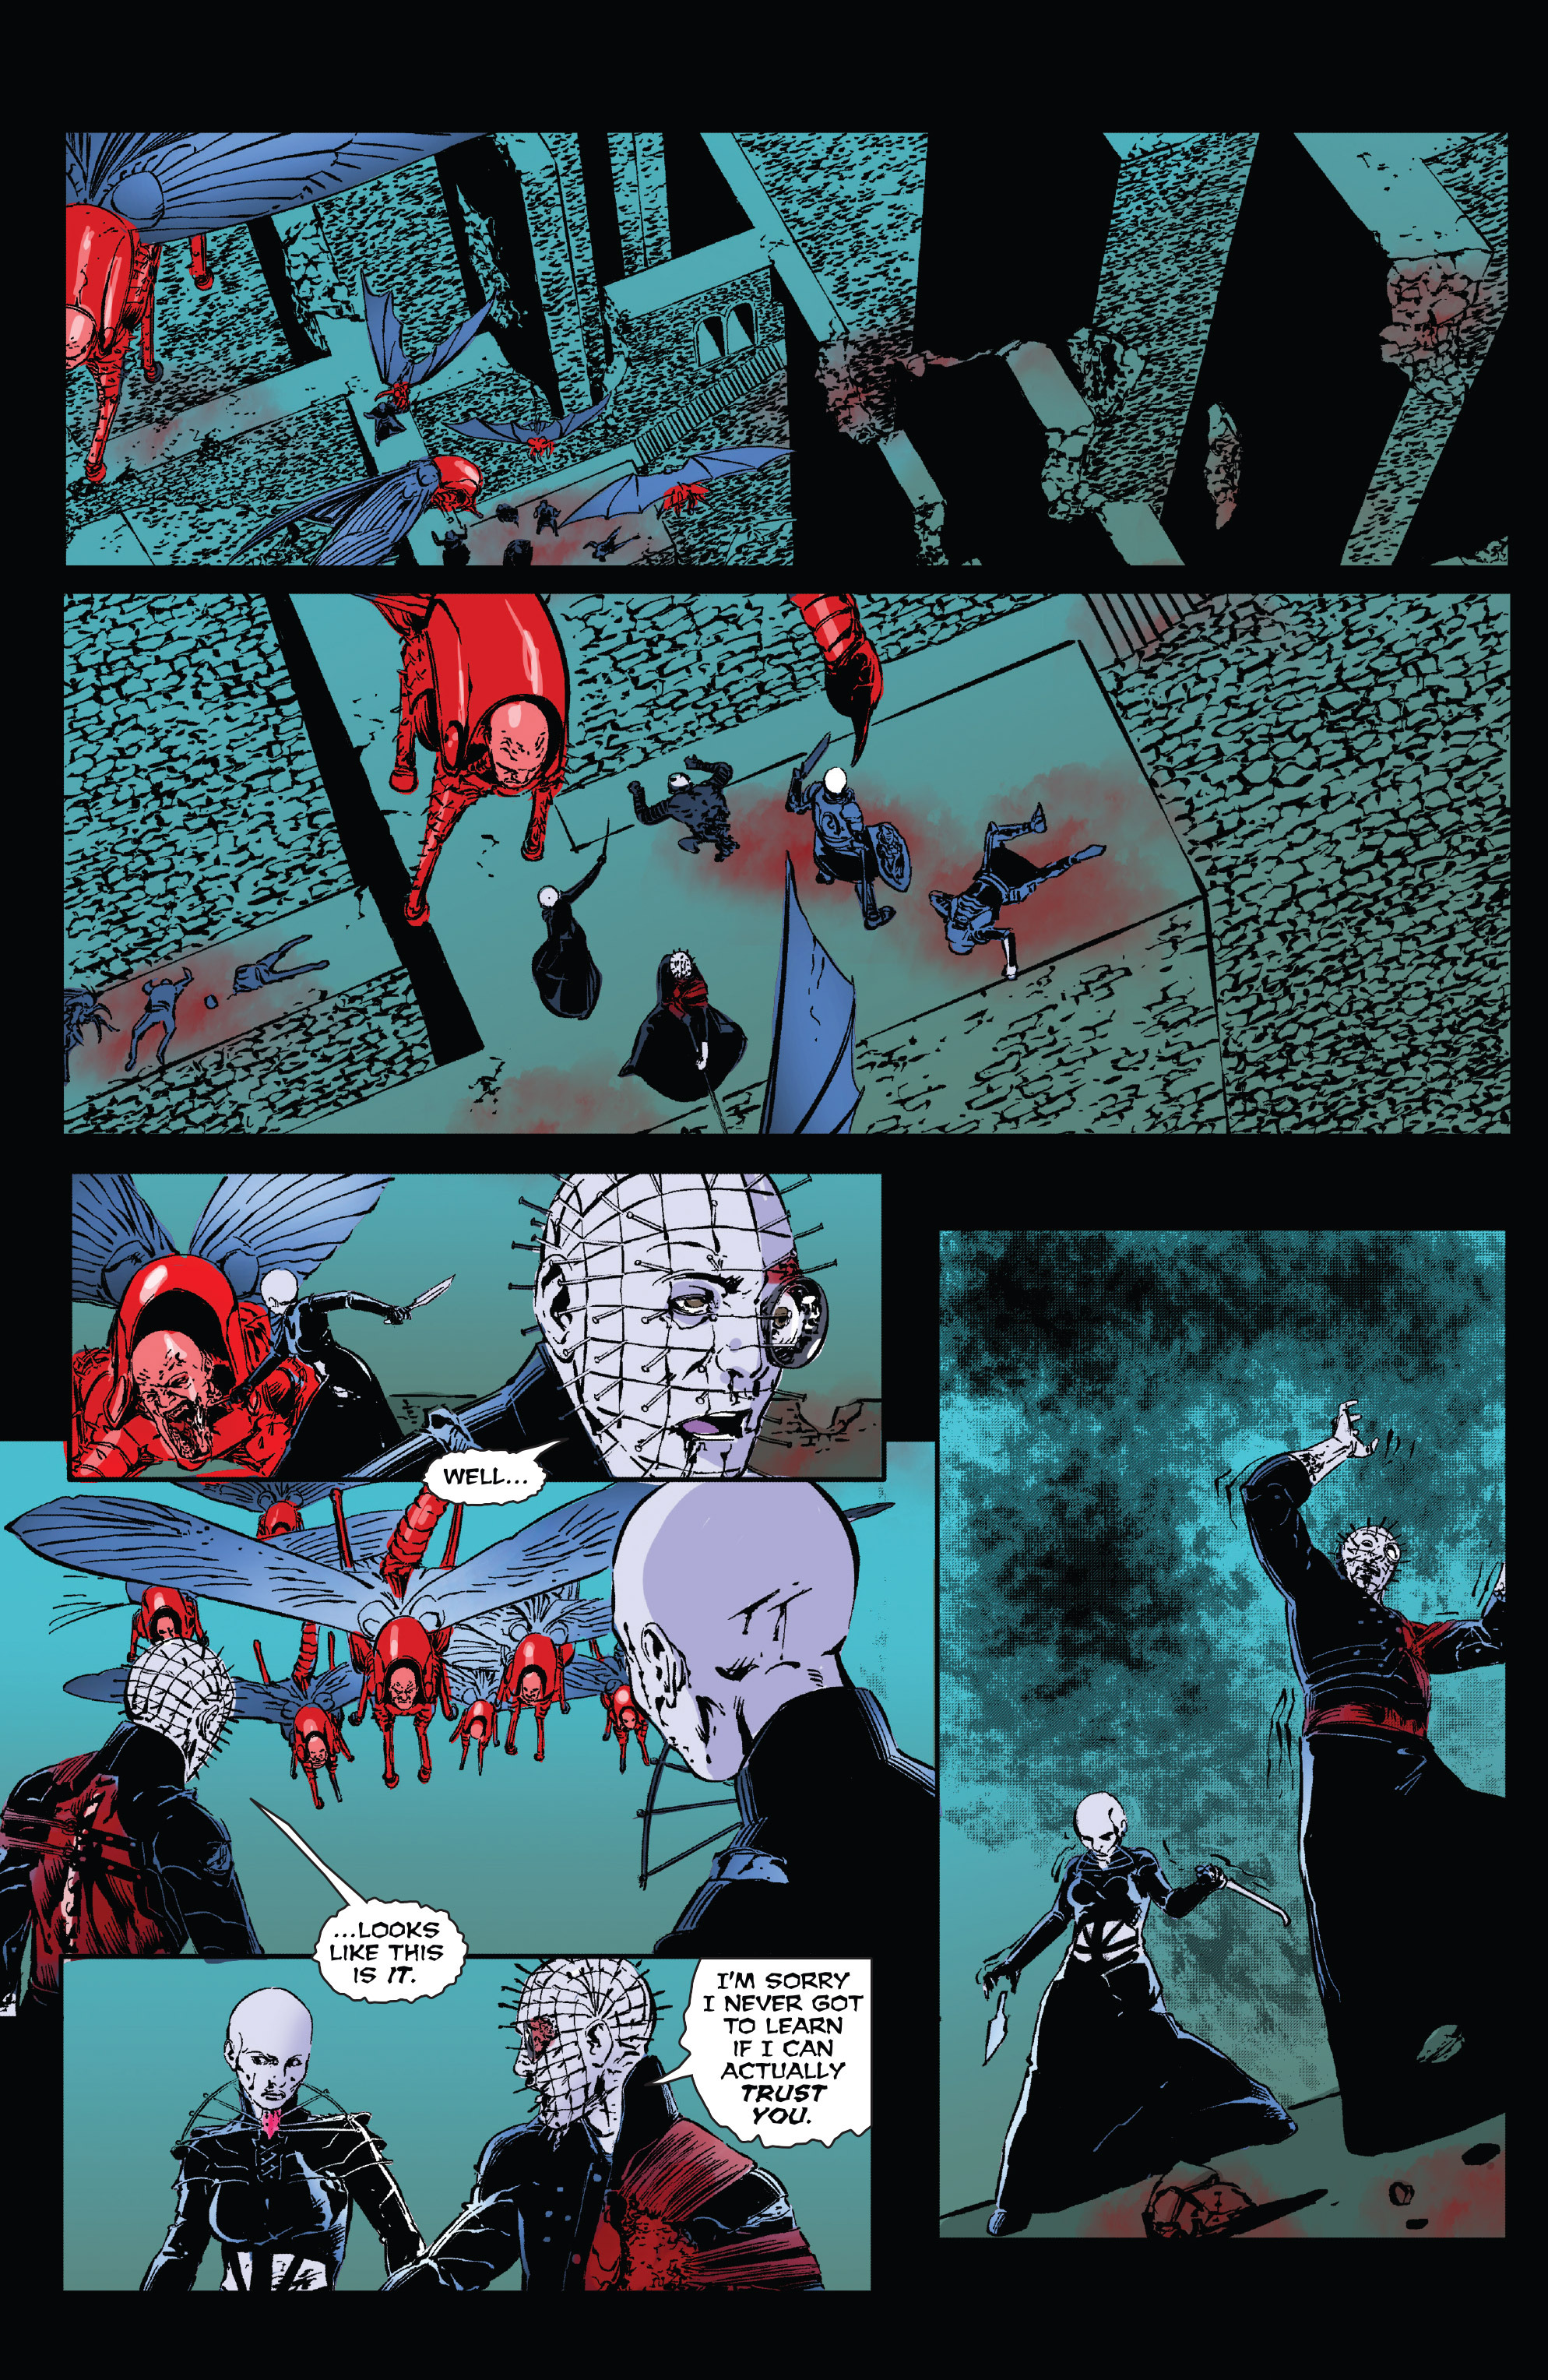 Read online Clive Barker's Hellraiser: The Dark Watch comic -  Issue # TPB 3 - 122